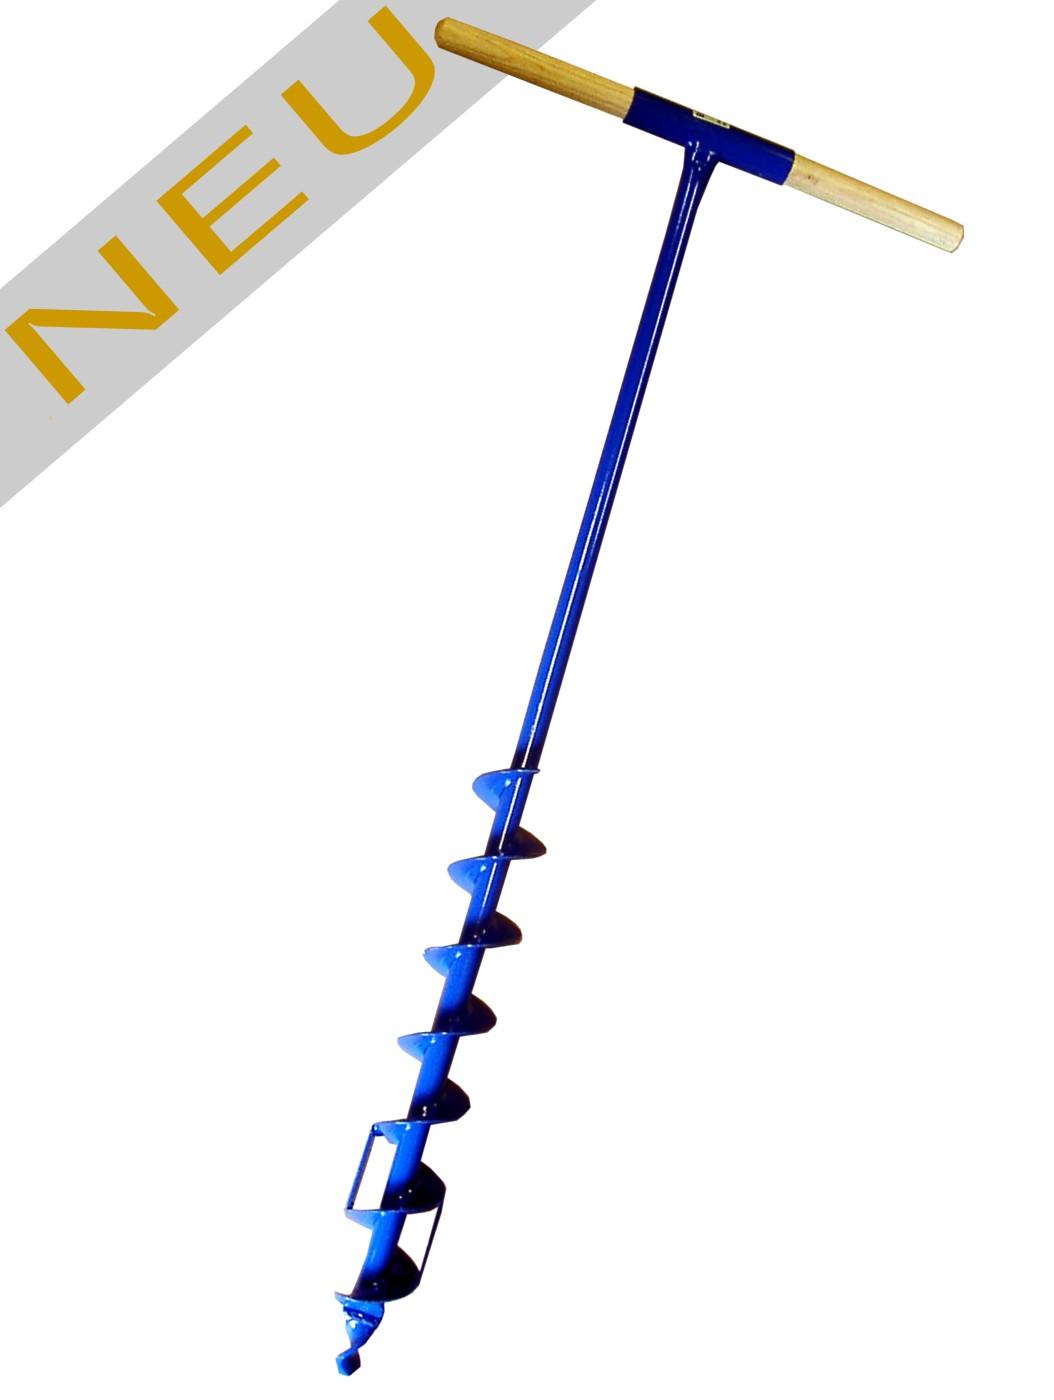 Erdbohrer Erdlochbohrer Handbohrer Durchmesser 110mm